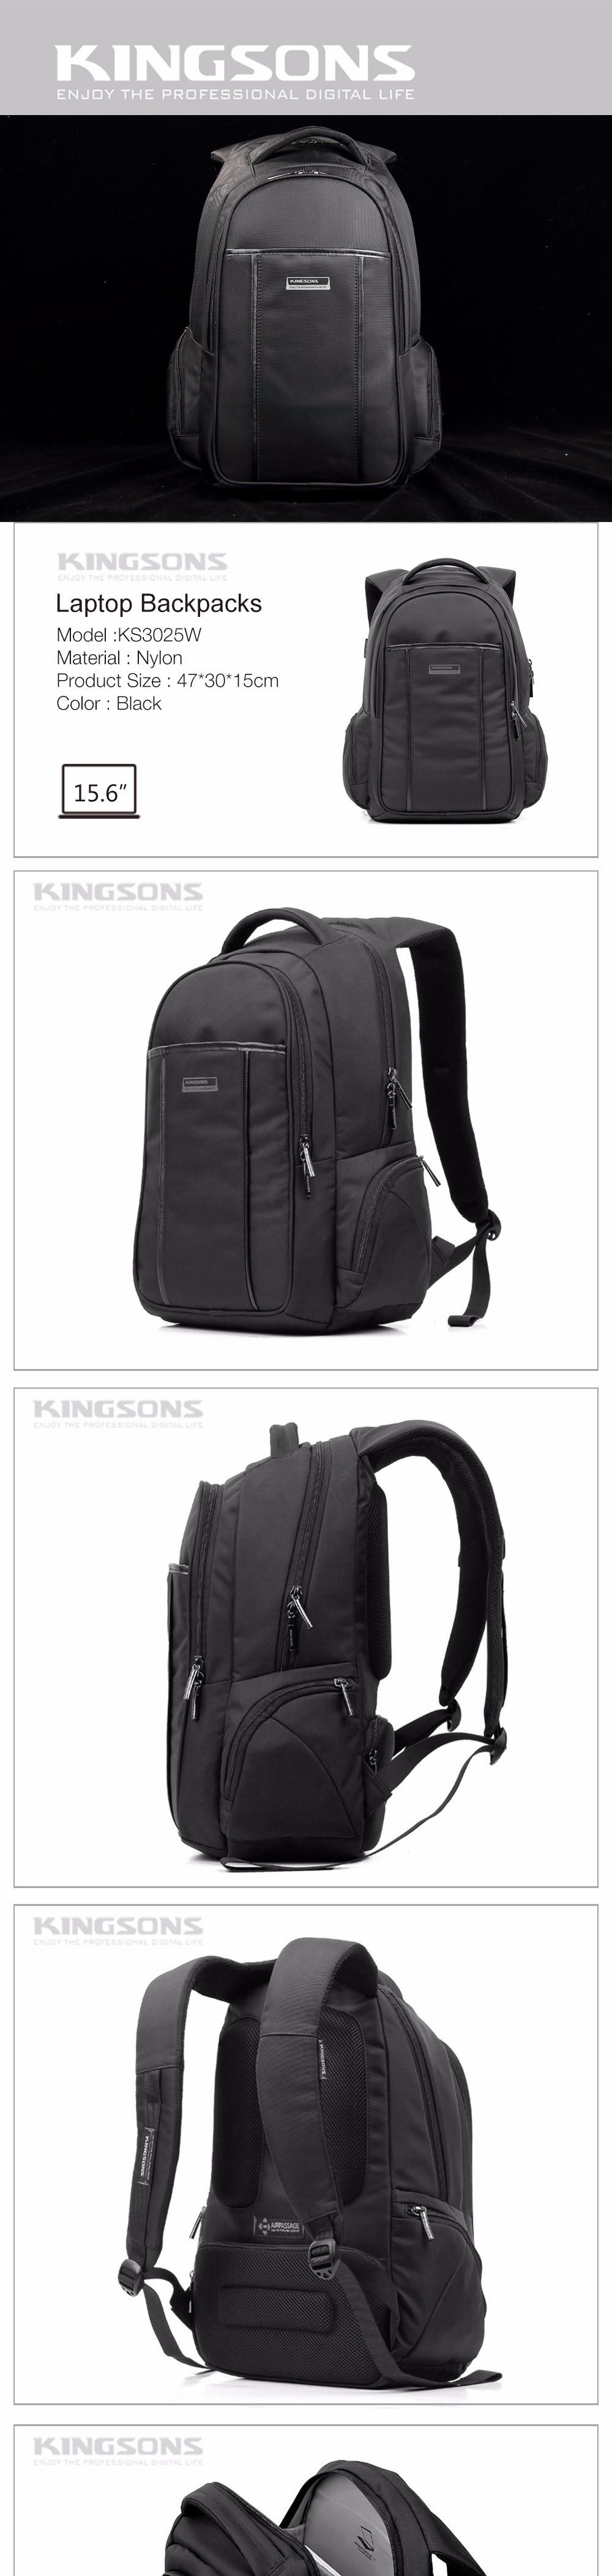 15.6 Laptop Backpacks Vintage Bag Men's Backpack Women Rucksack Waterproof Nylon SchoolBag Fashion Mochila Black Drop Shipping